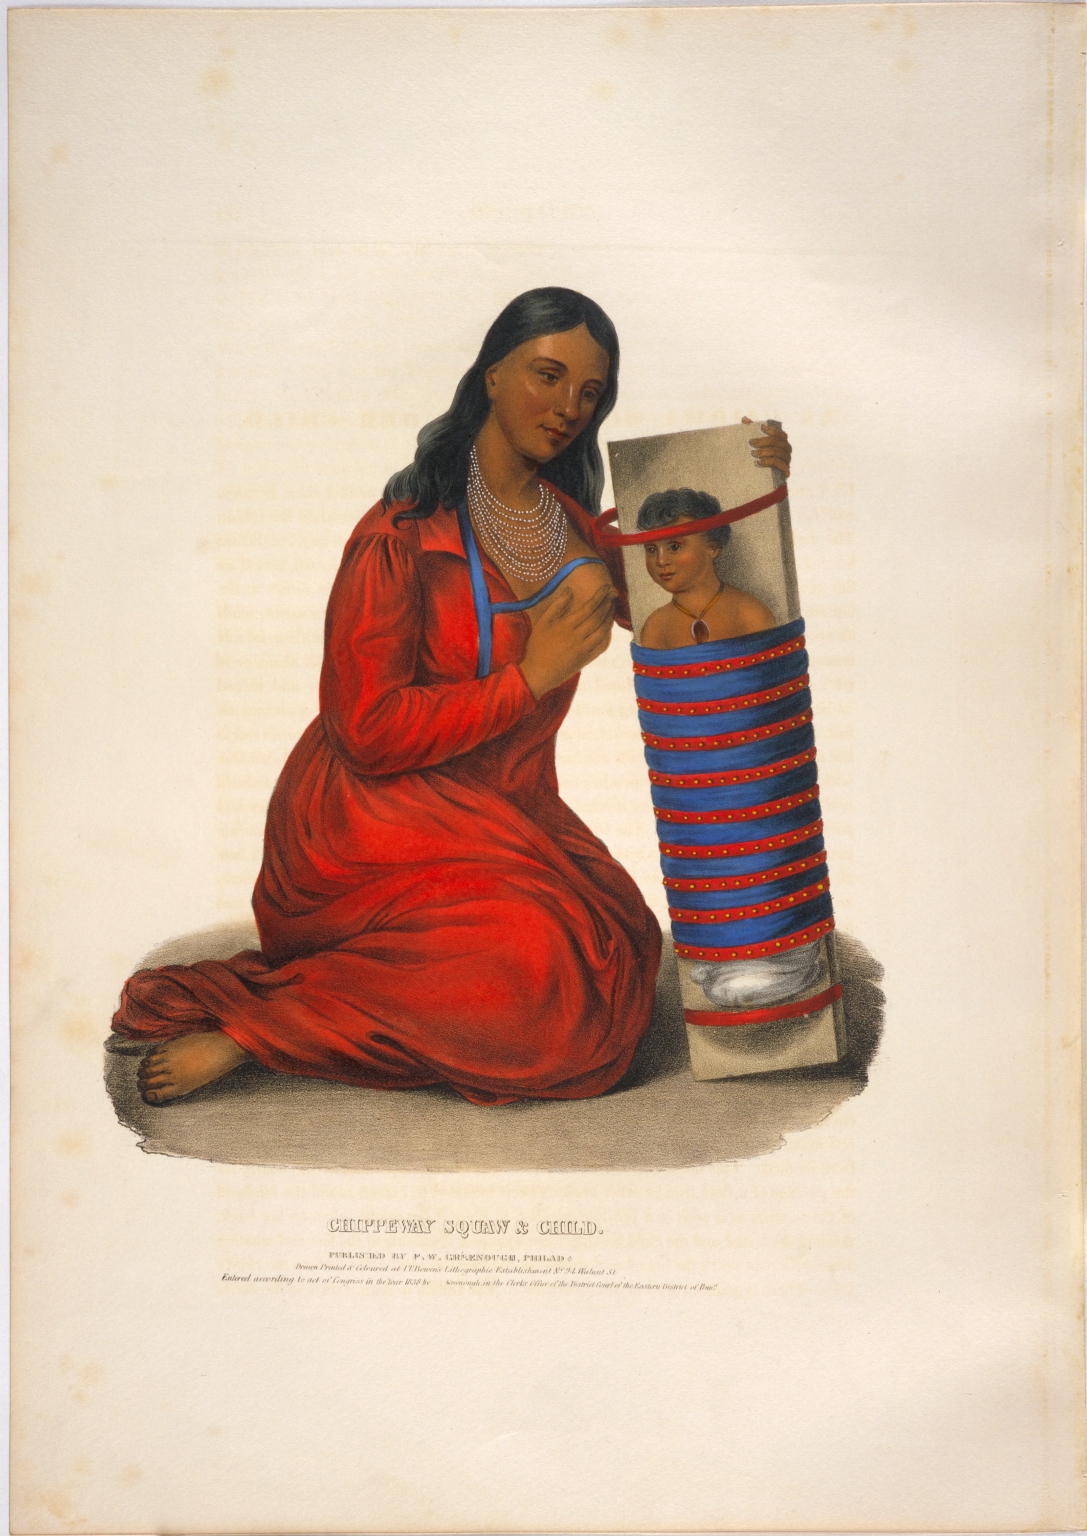 Chippeway squaw & child